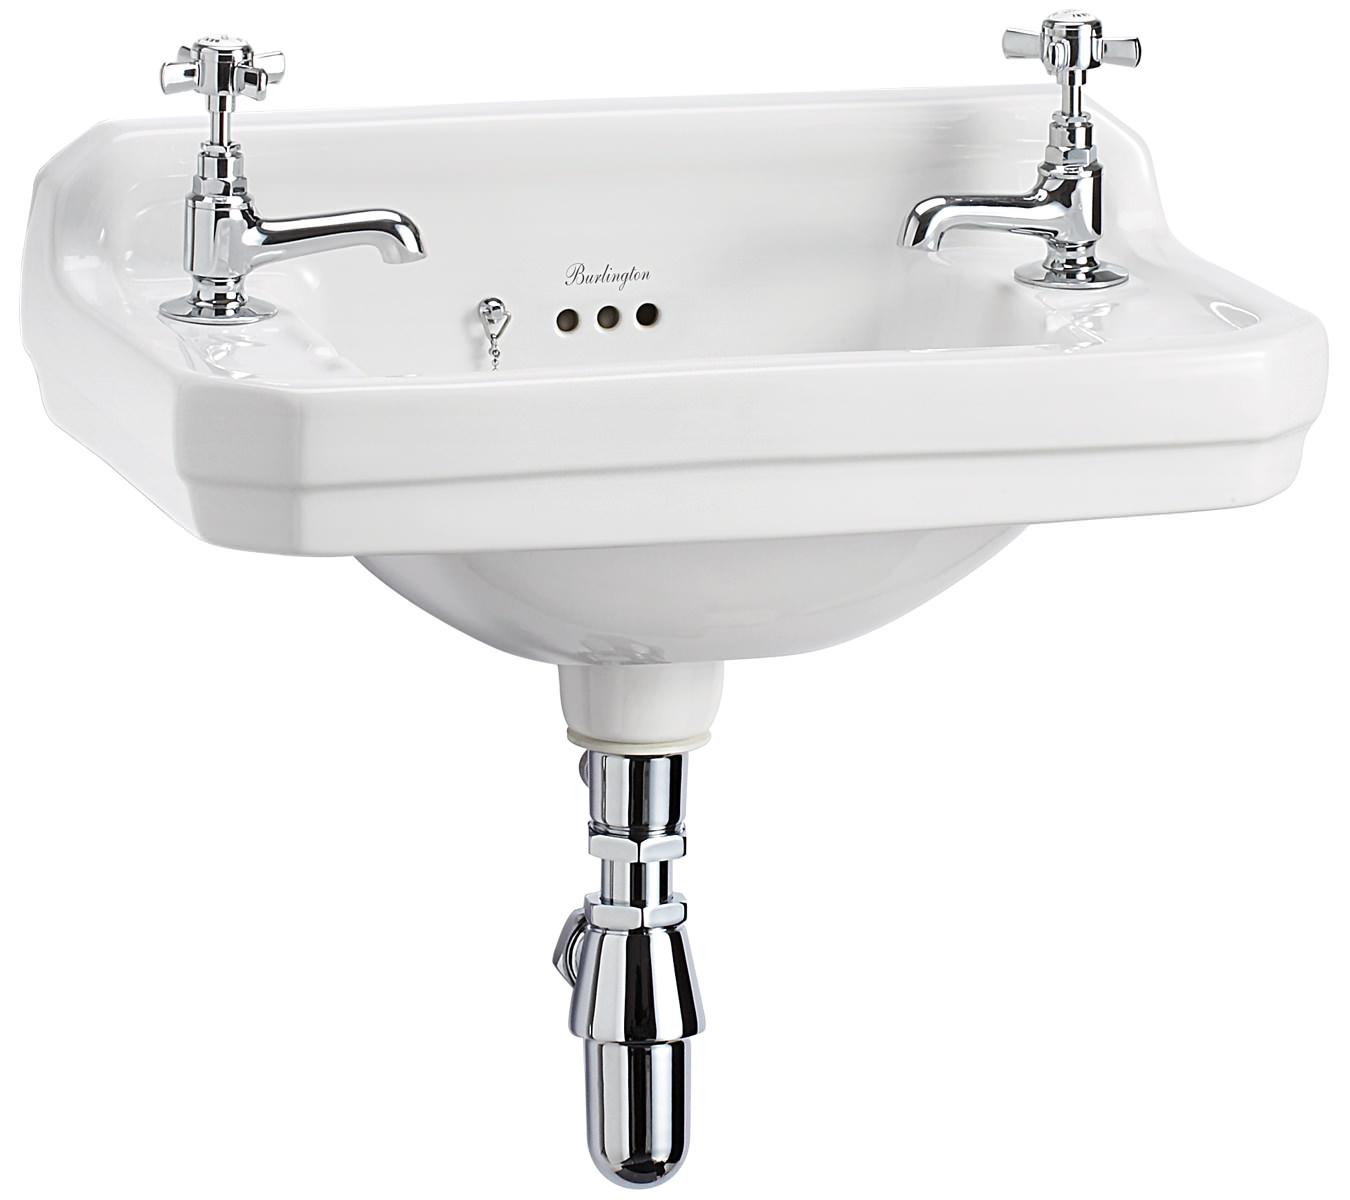 supplies bathrooms basins wall hung burlington edwardian wall mounted ...